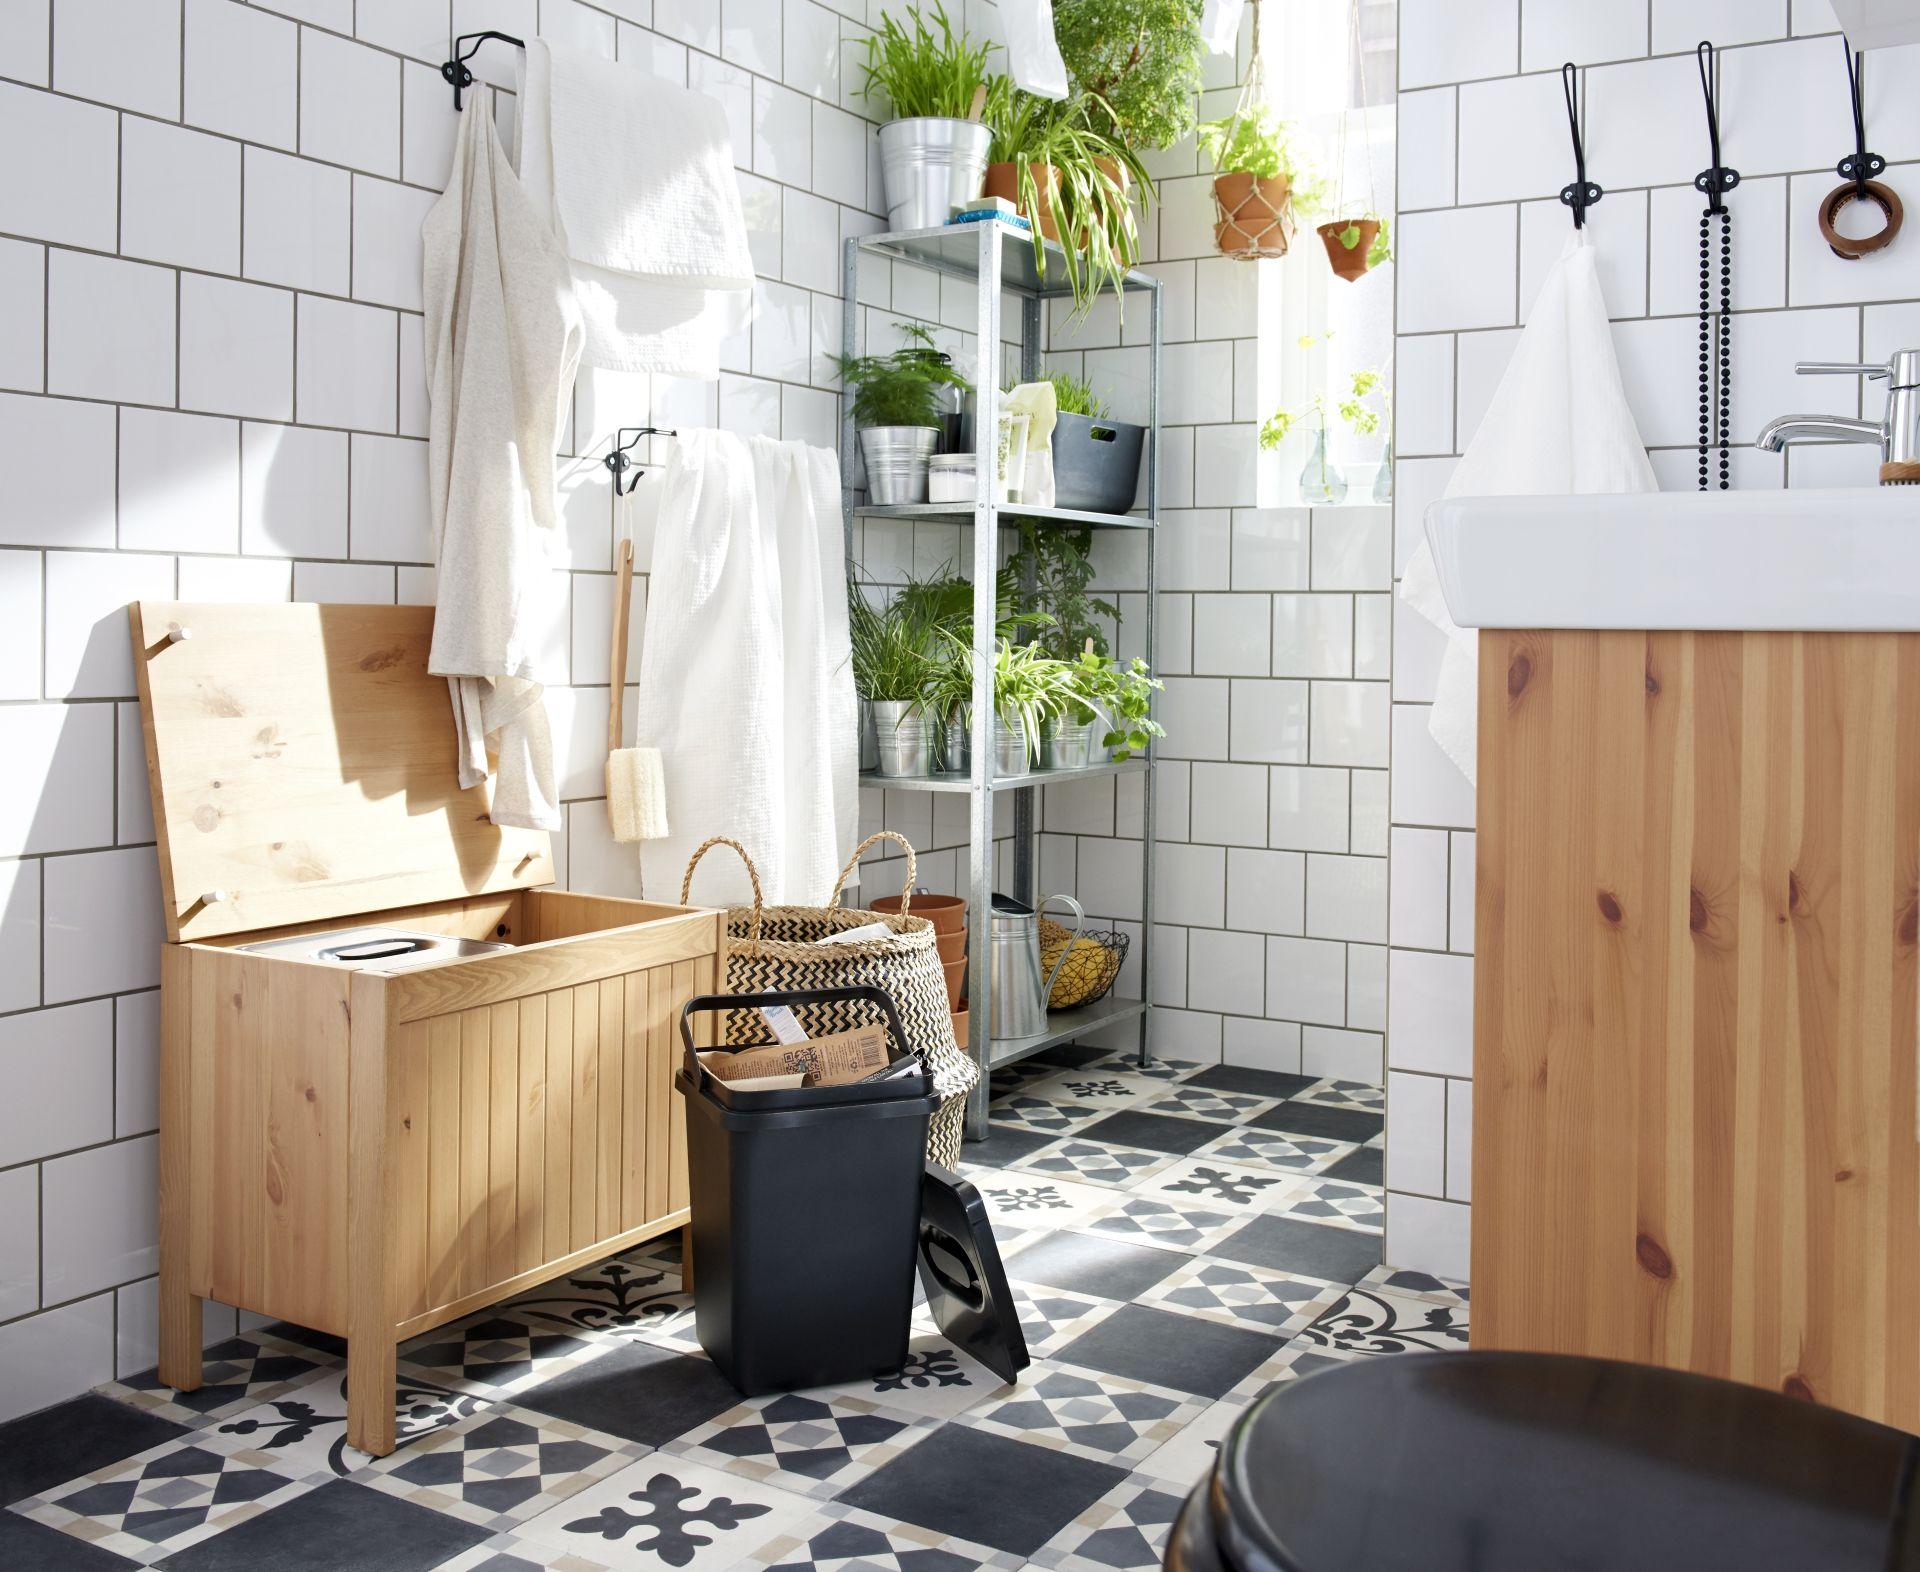 Ikea bank badkamer ikea badkamer planner planners ikea overal